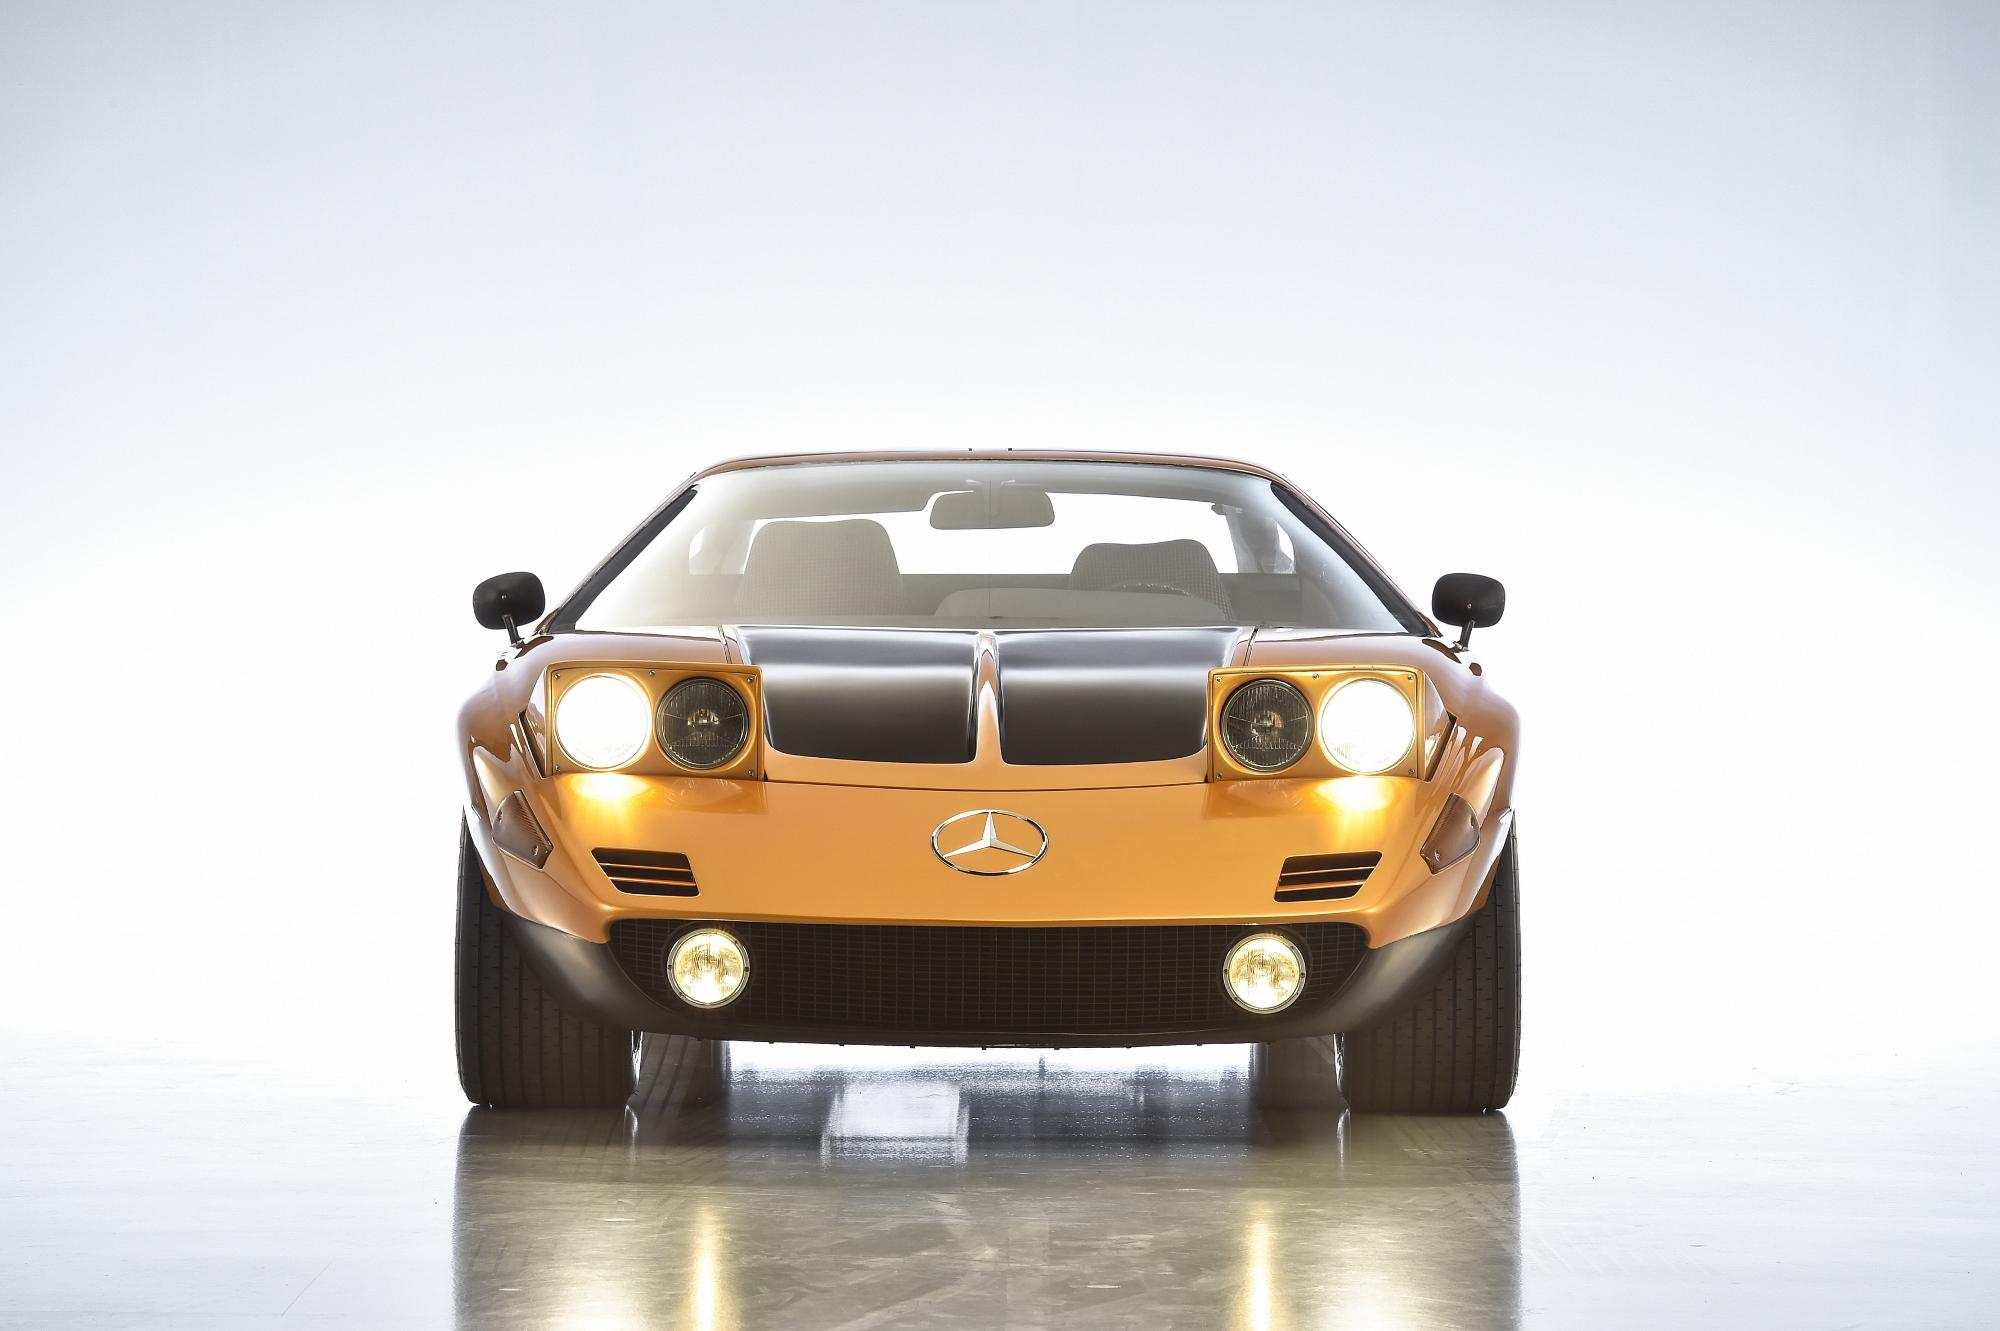 Mercedes C 111-II: premiéra pred 50 rokmi na ženevskom autosalóne 1970 YwnTW1O5lQ mercedes-c111-ii-9